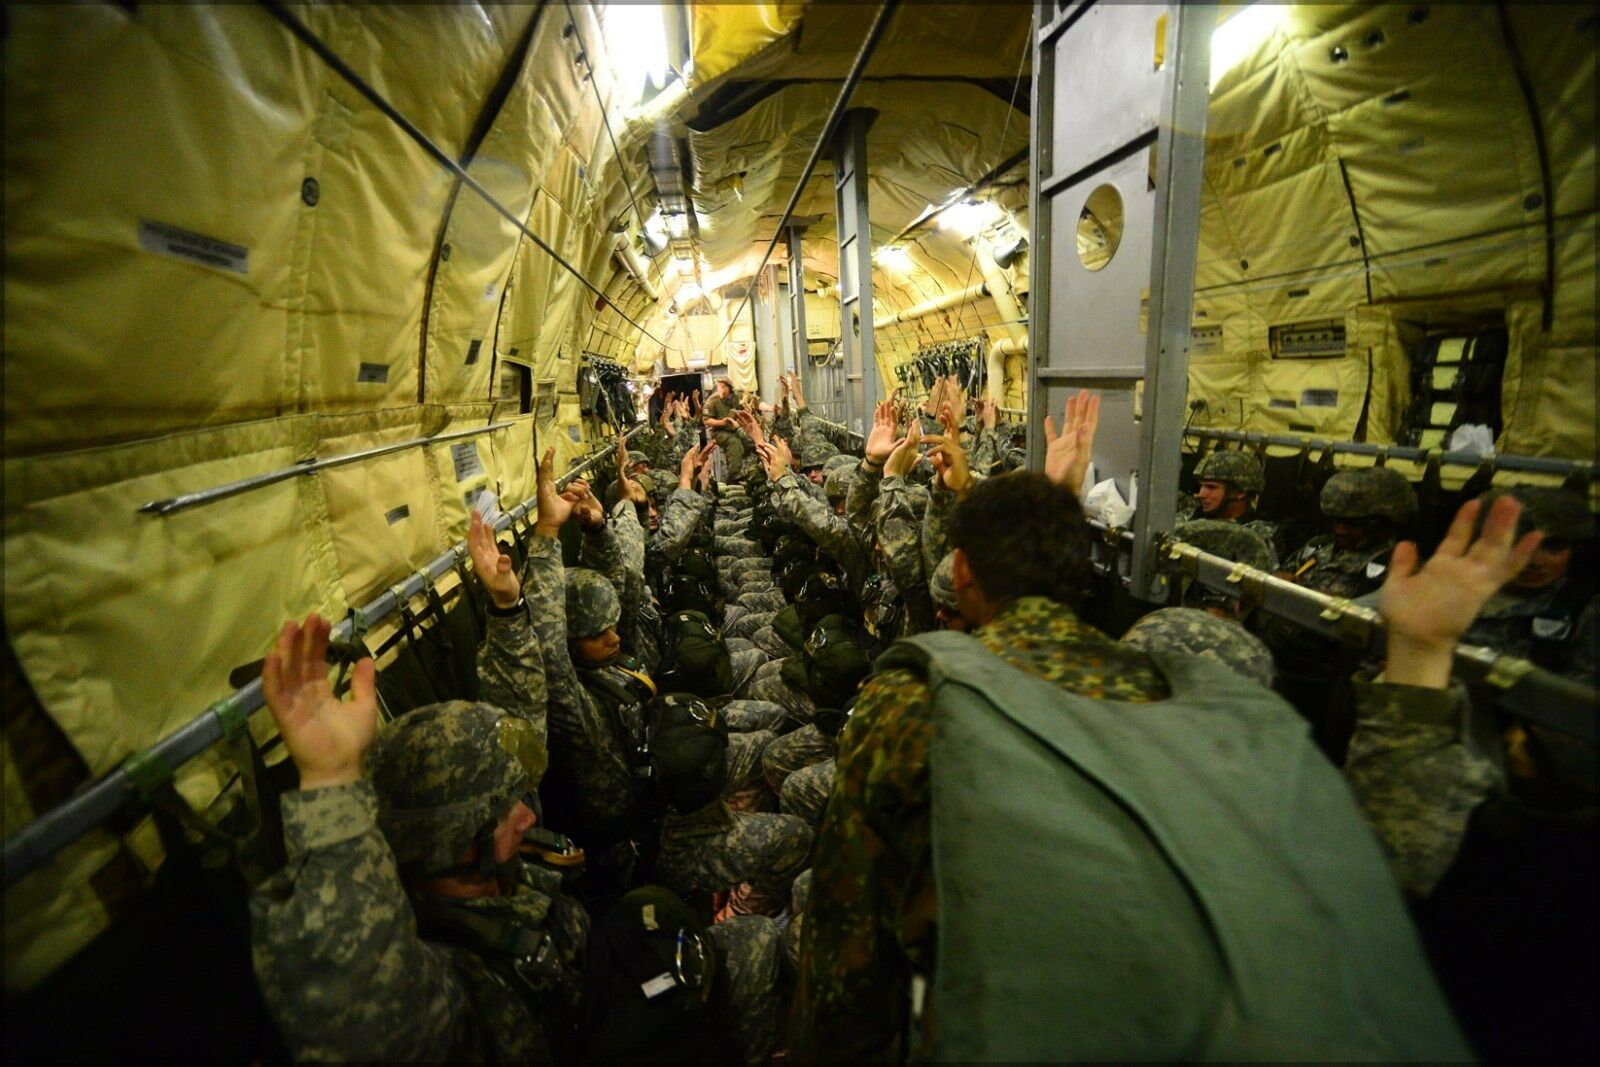 Poster, Poster, Poster, Molte Misure; U.S.ARMY Paracadutisti con 82nd Trasportate Dall' Aria 7a16d9